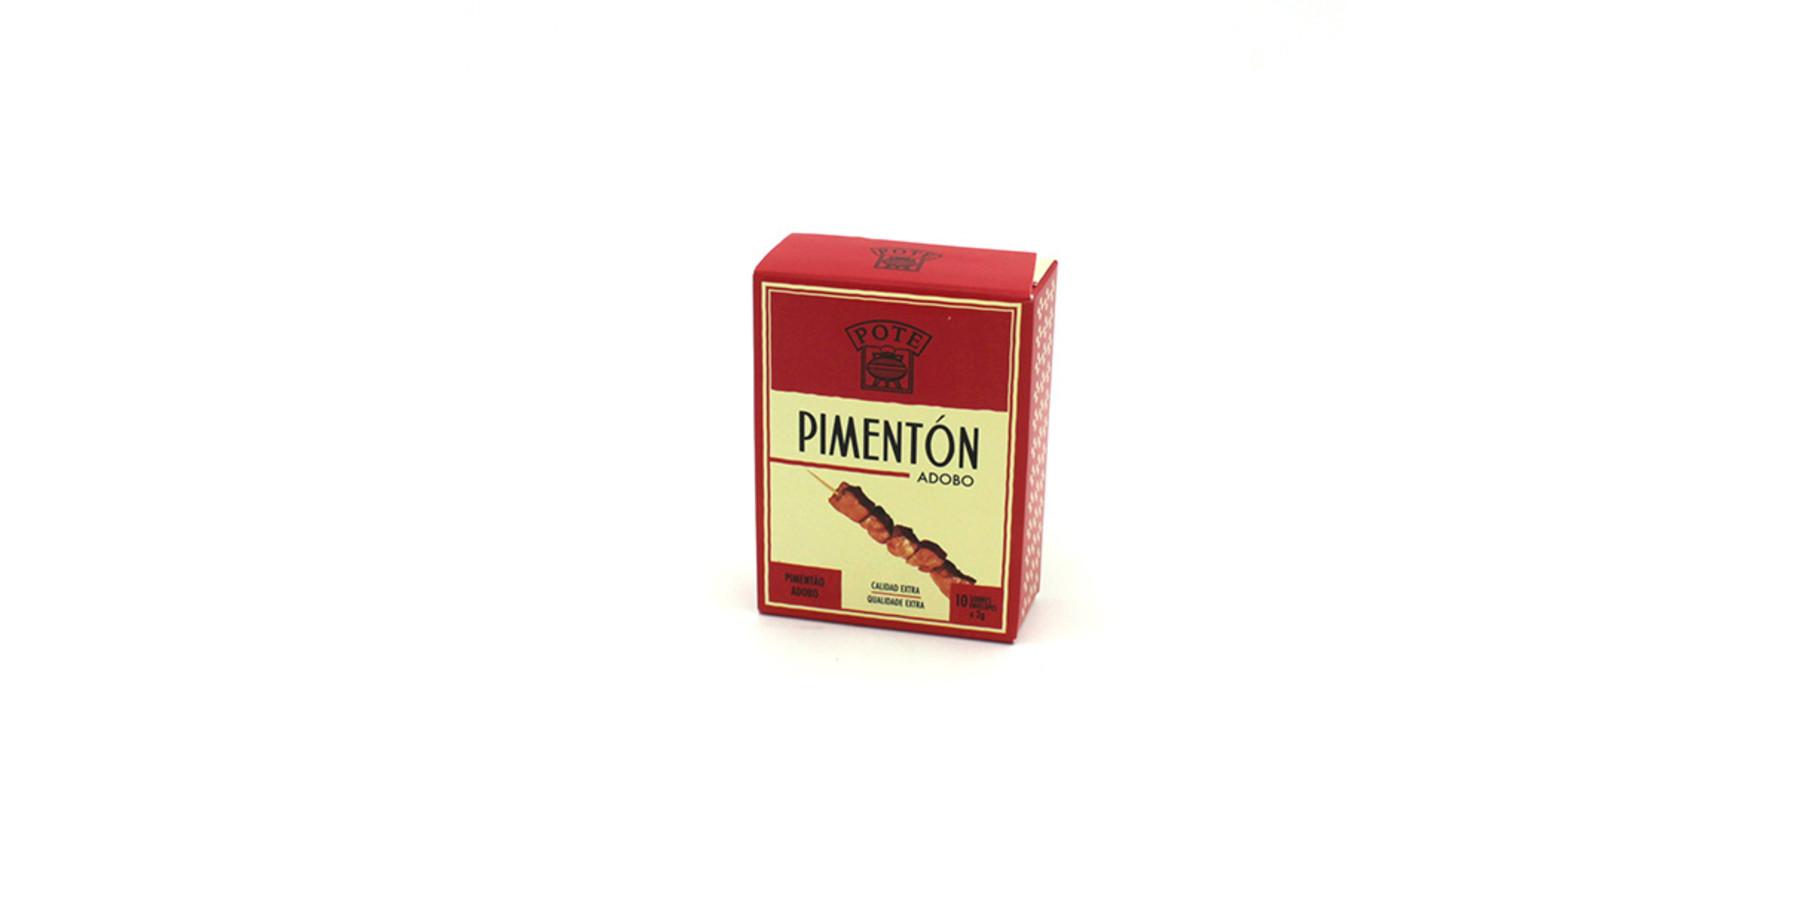 Pimentón adobo, 10 zakjes